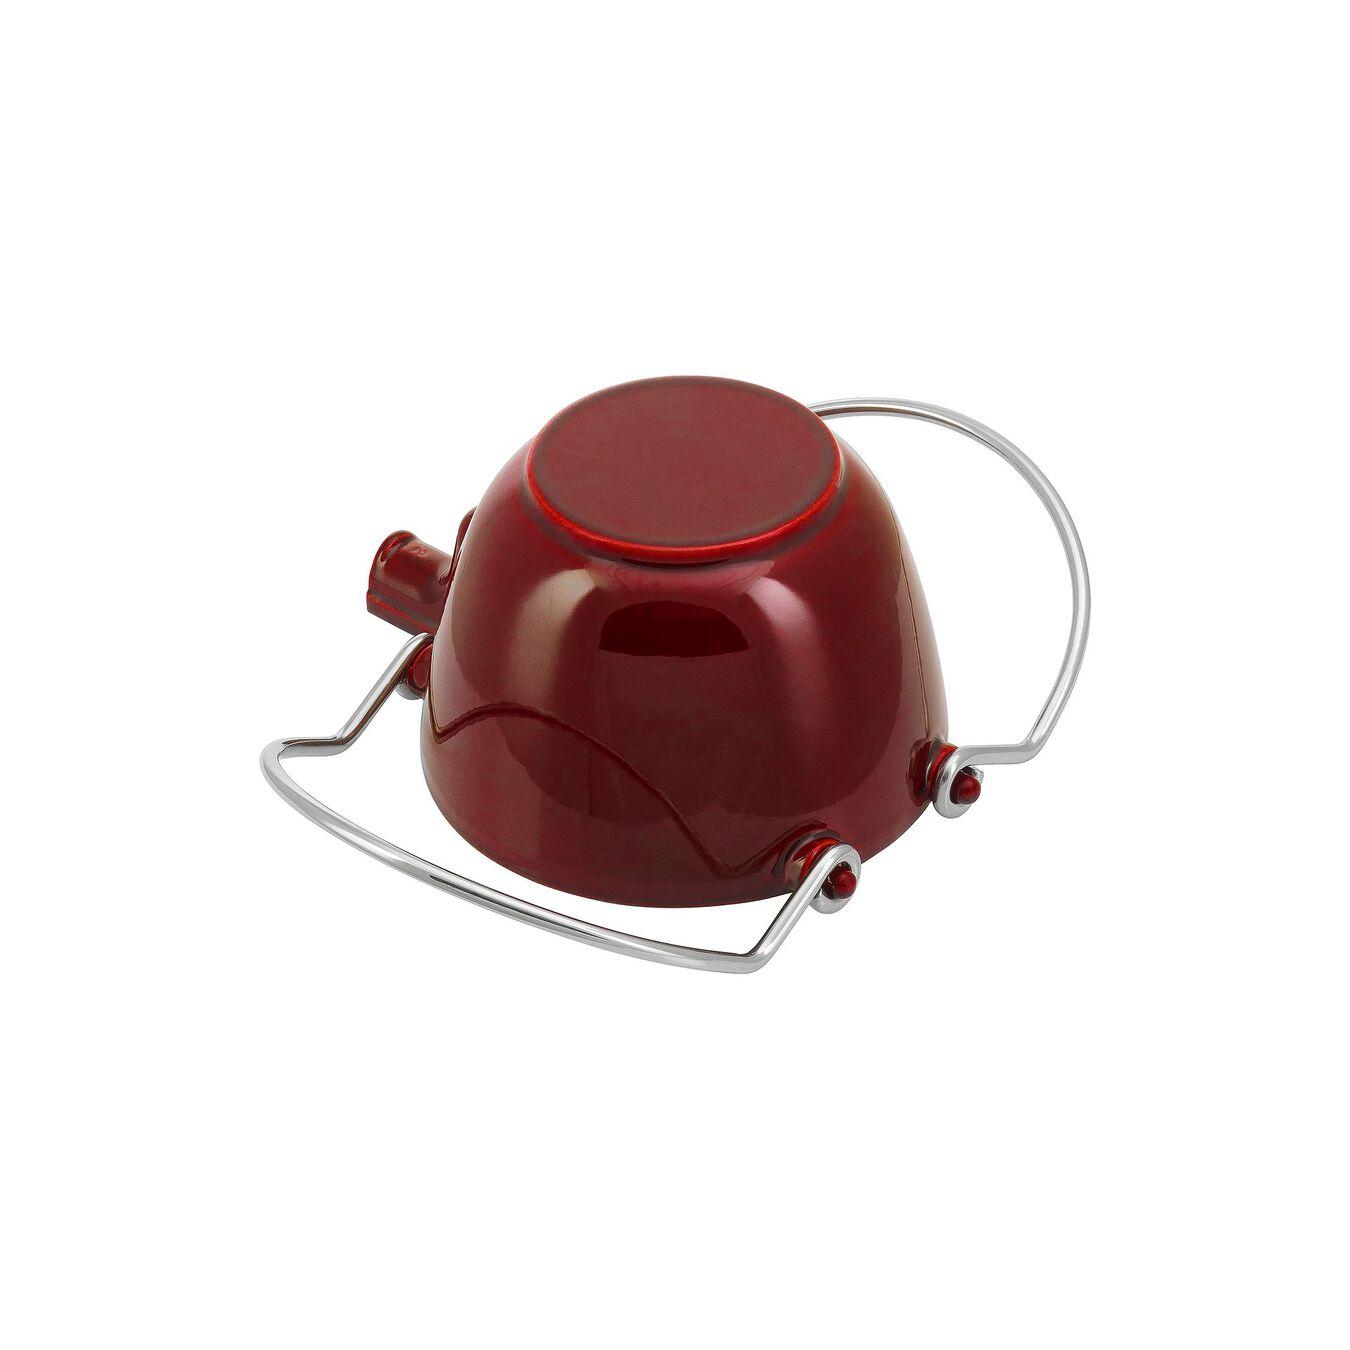 1-qt Round Tea Kettle - Grenadine,,large 6